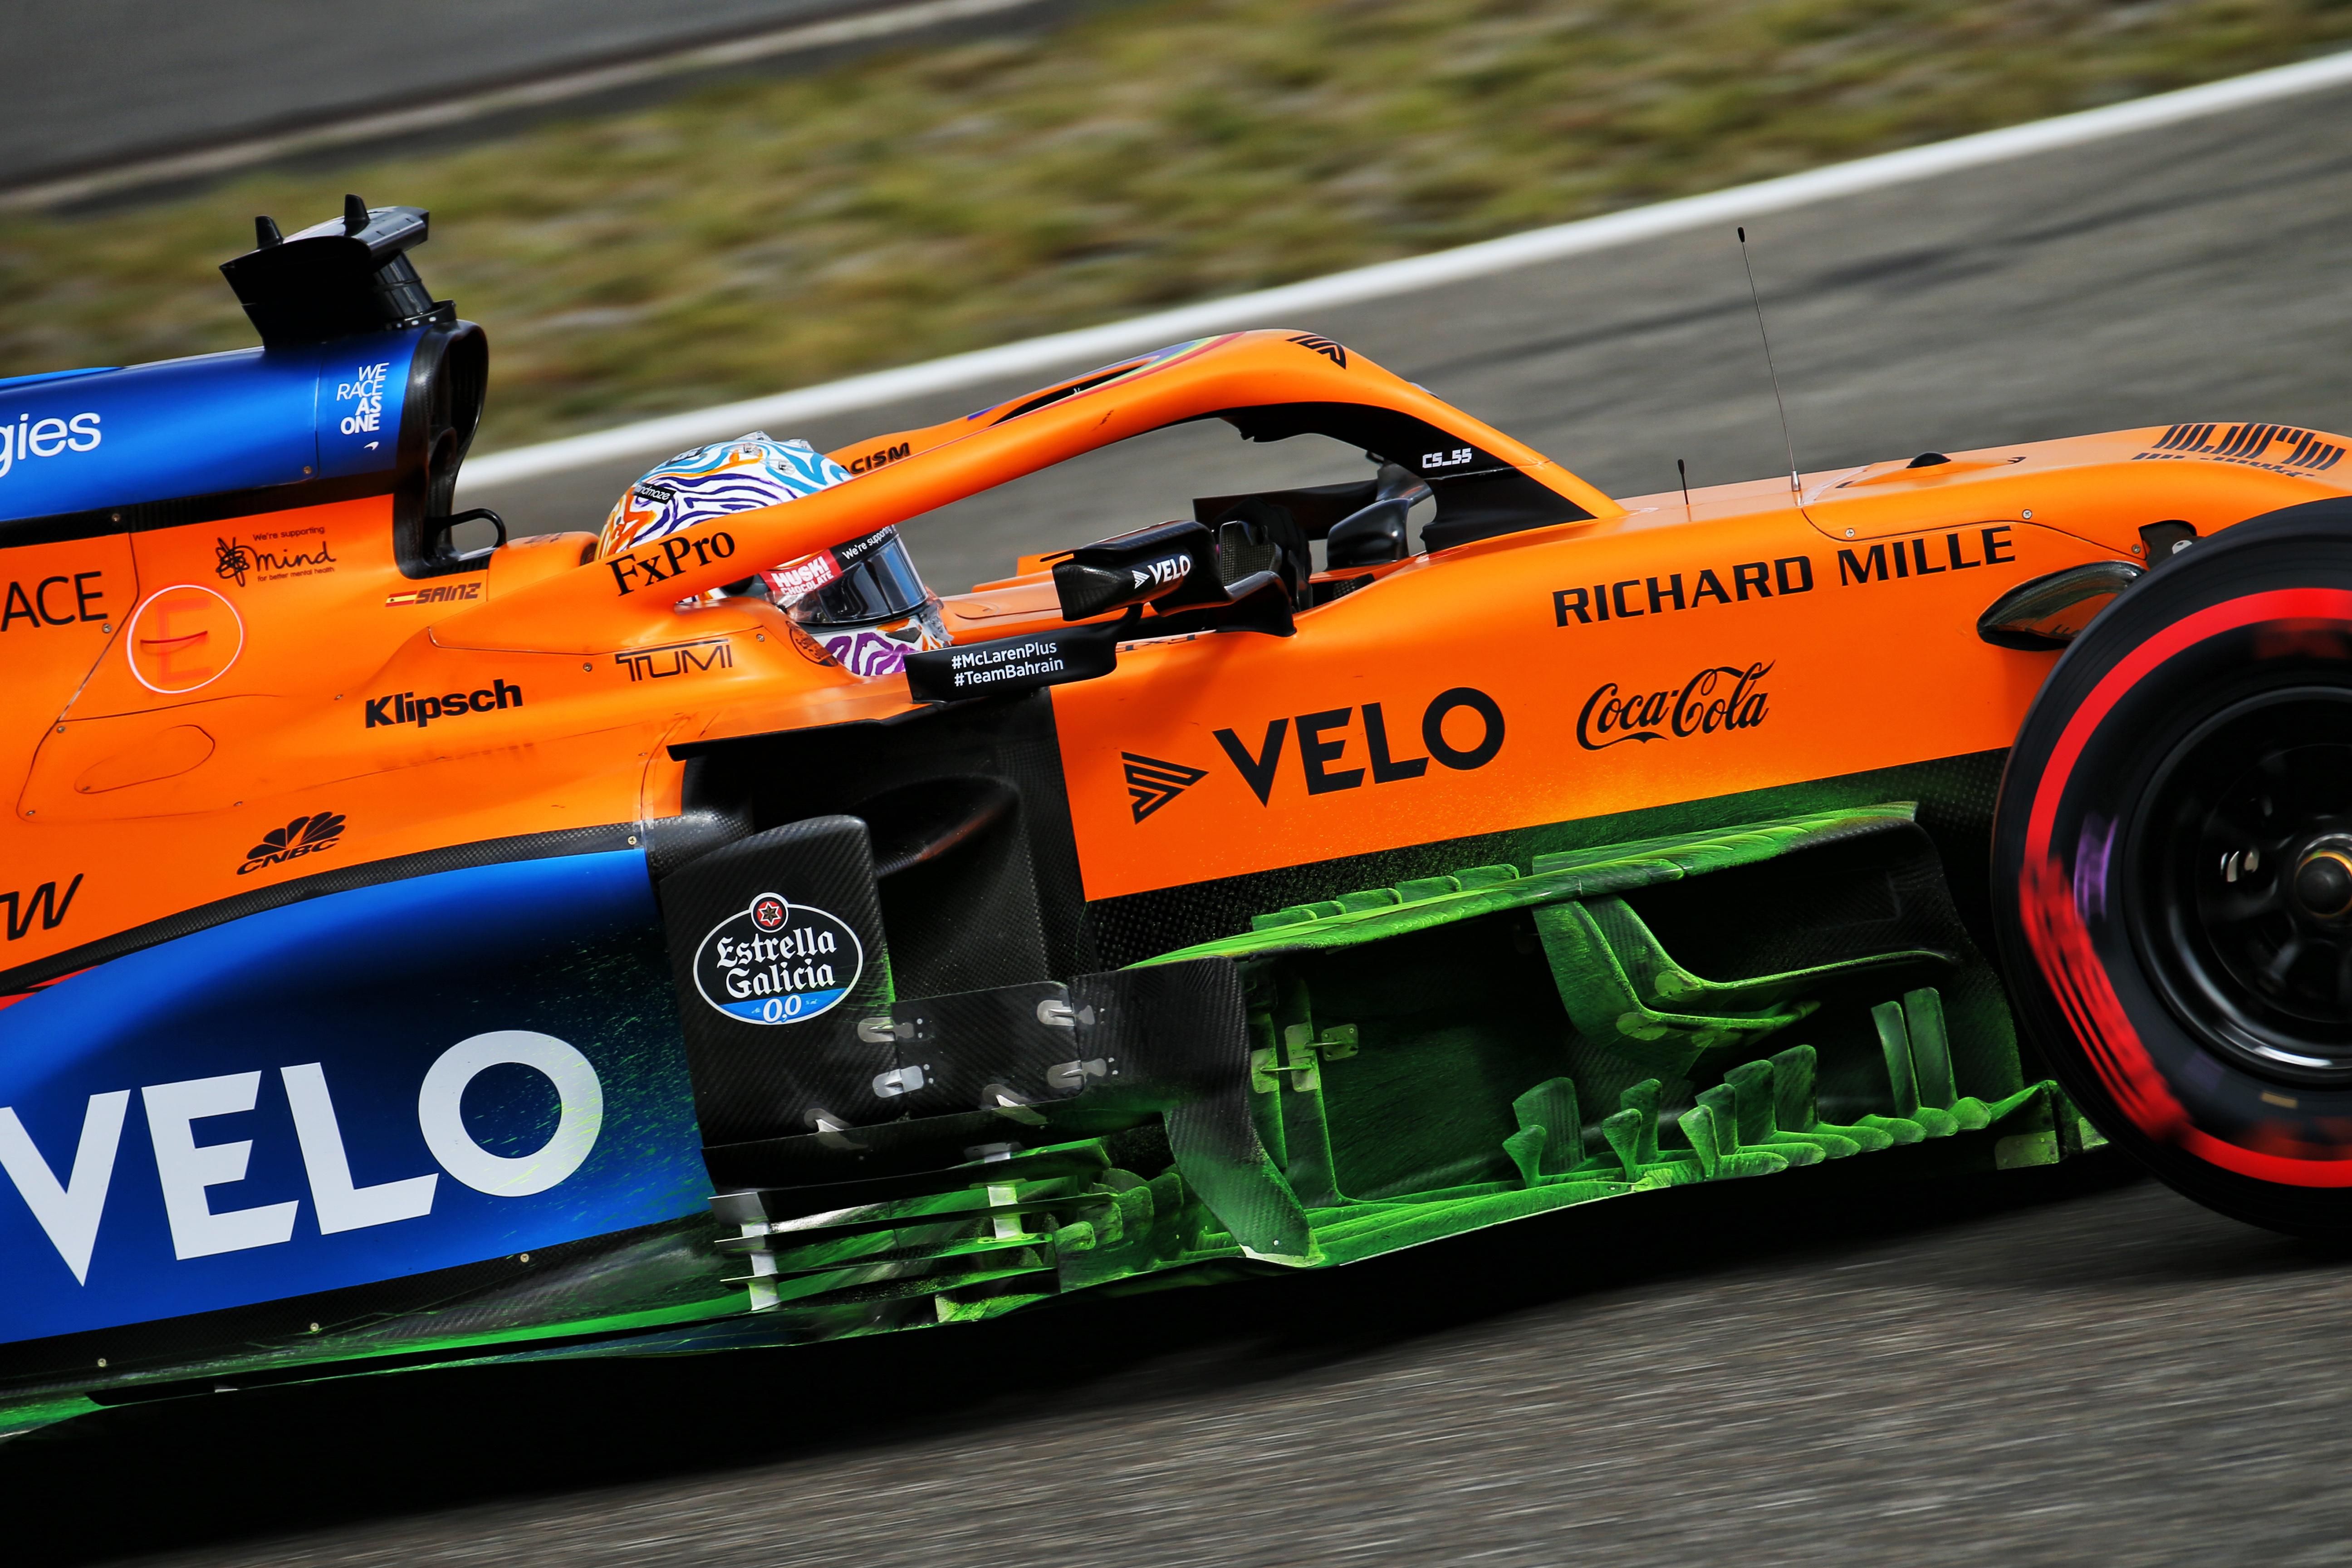 Motor Racing Formula One World Championship Eifel Grand Prix Qualifying Day Nurbugring, Germany